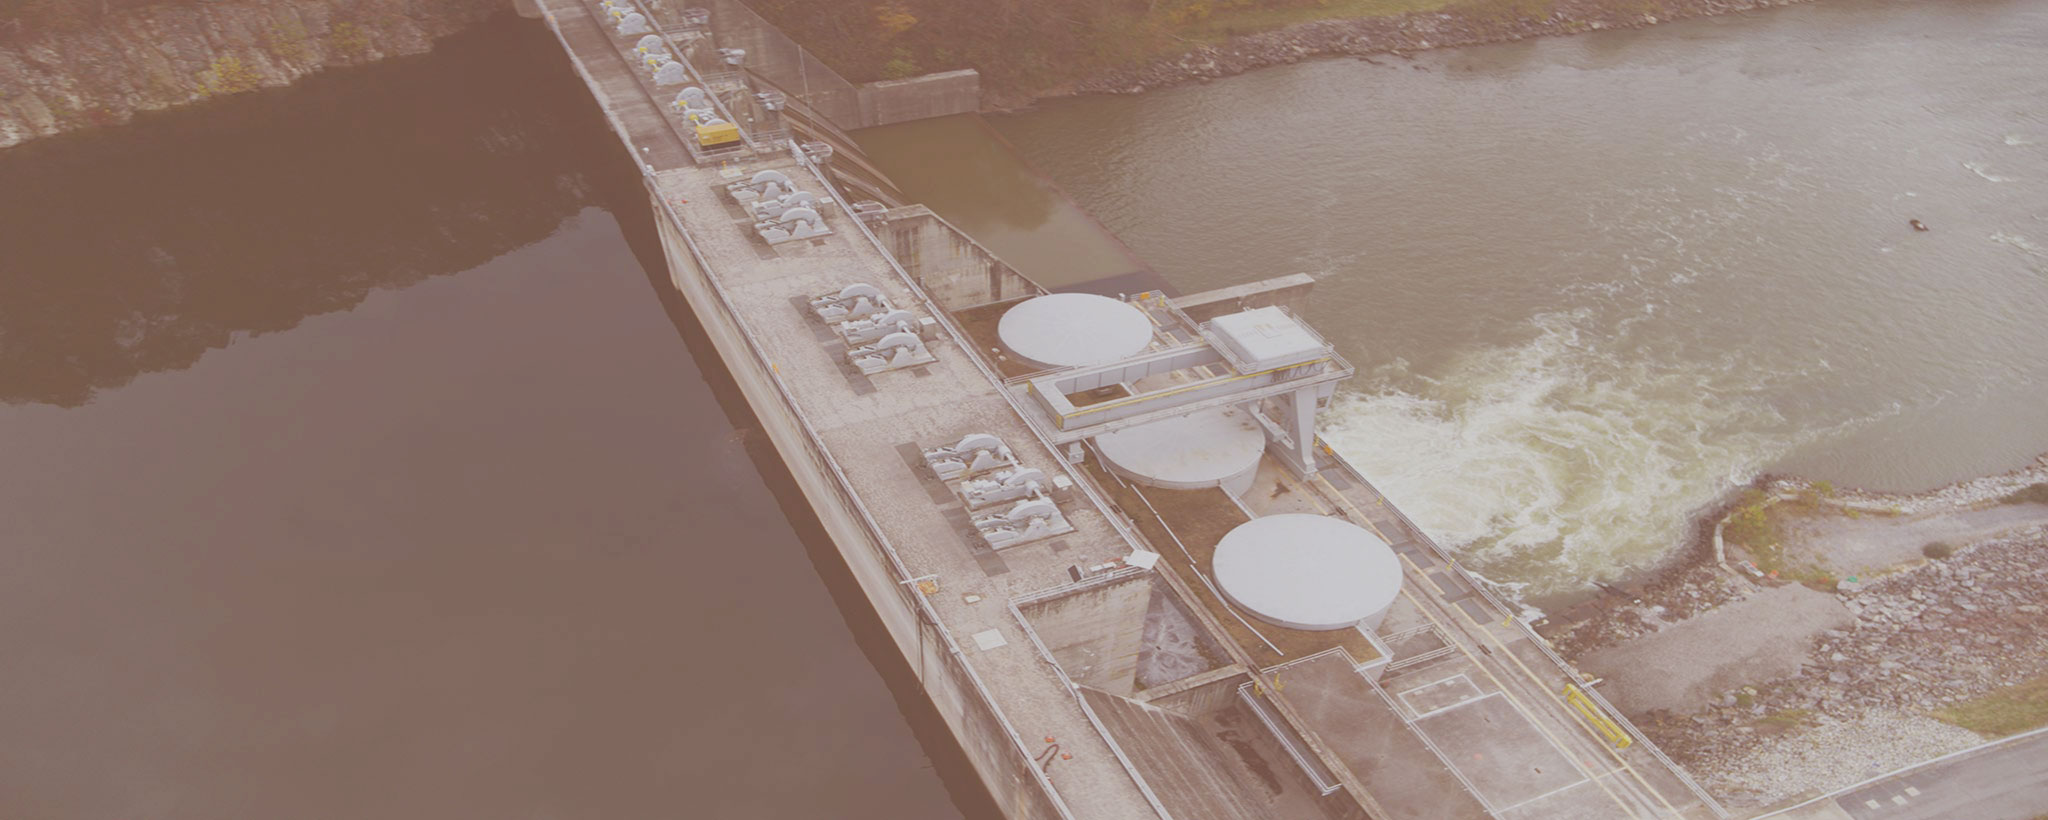 Boone Dam drone footage